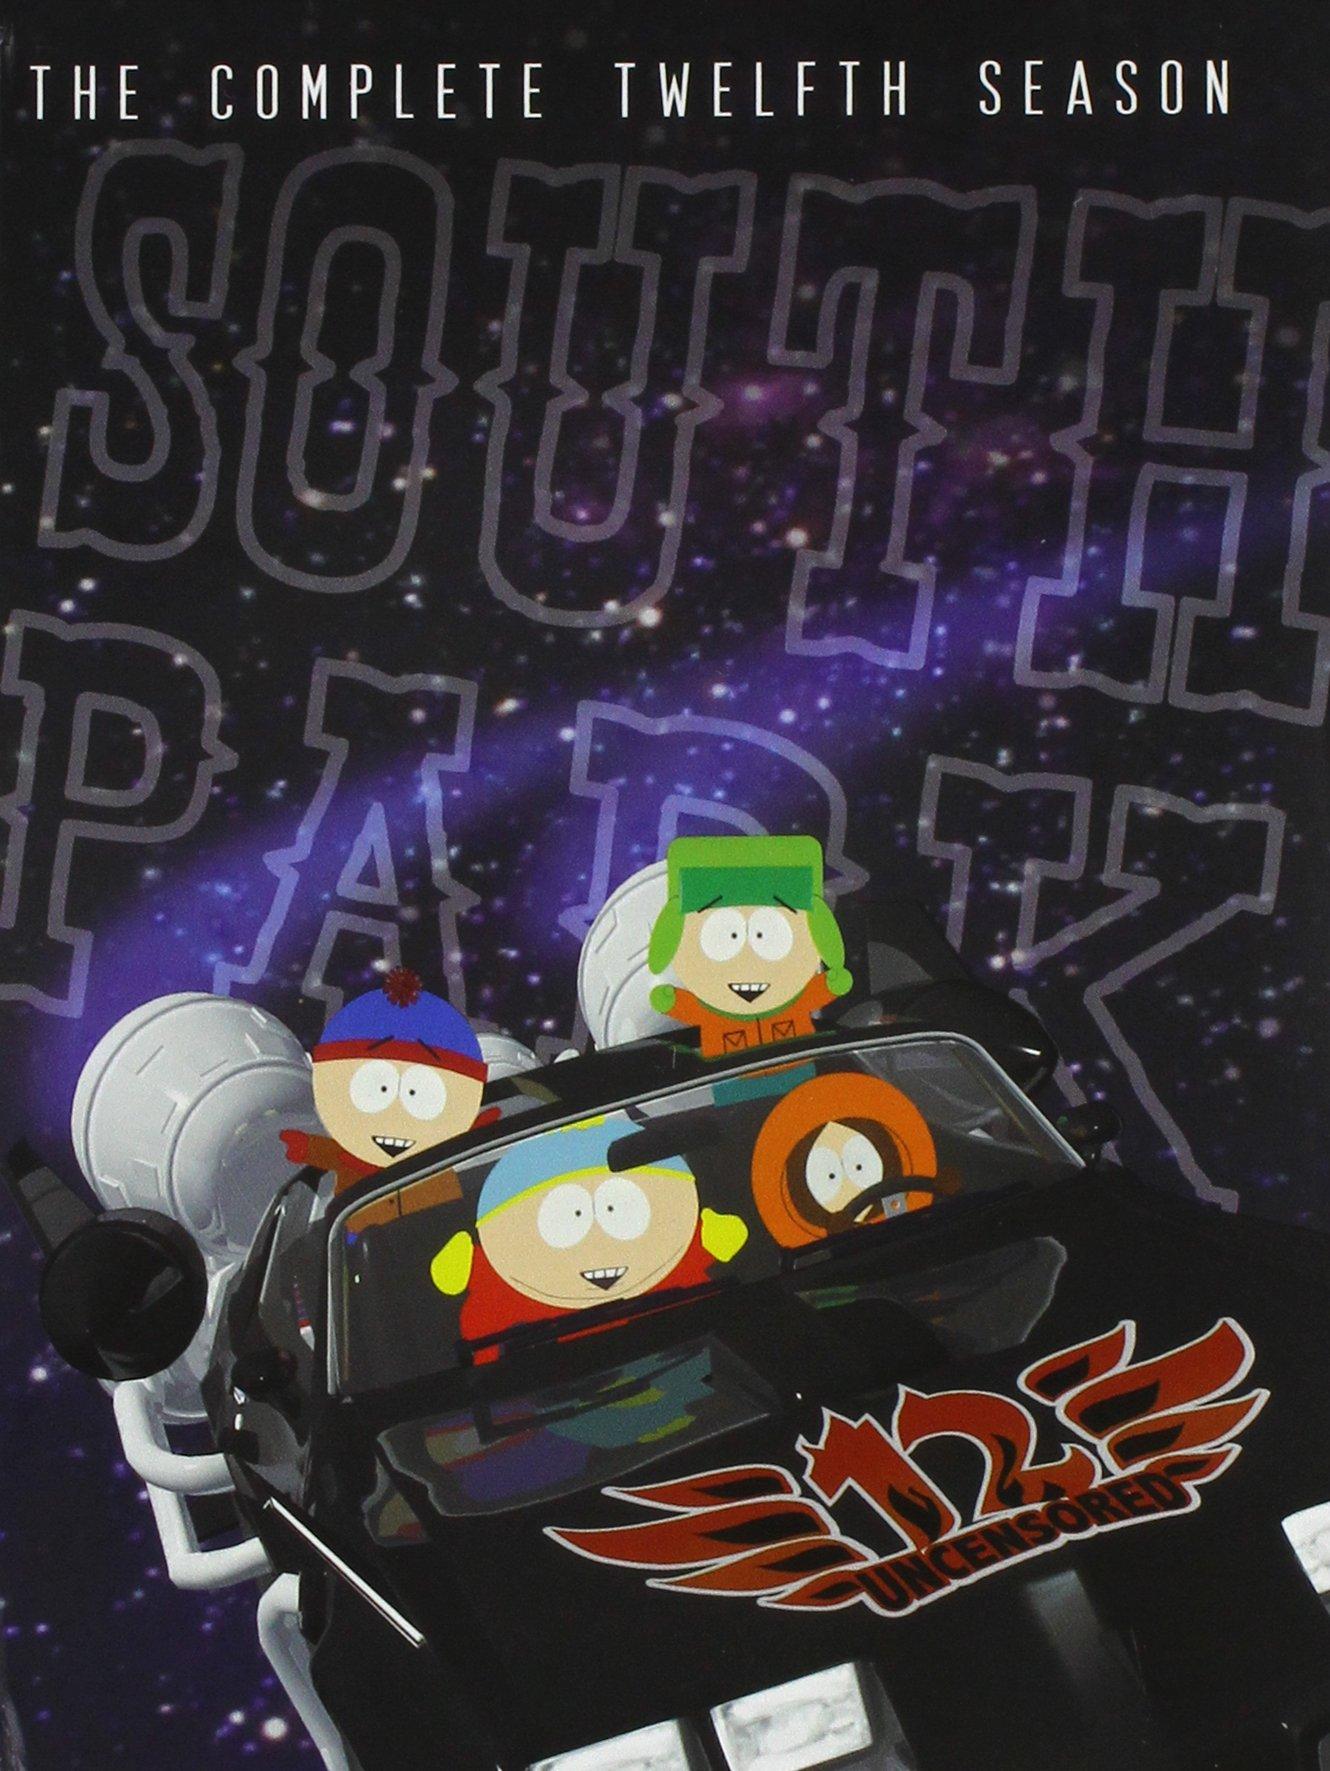 South Park: Complete Twelfth Season